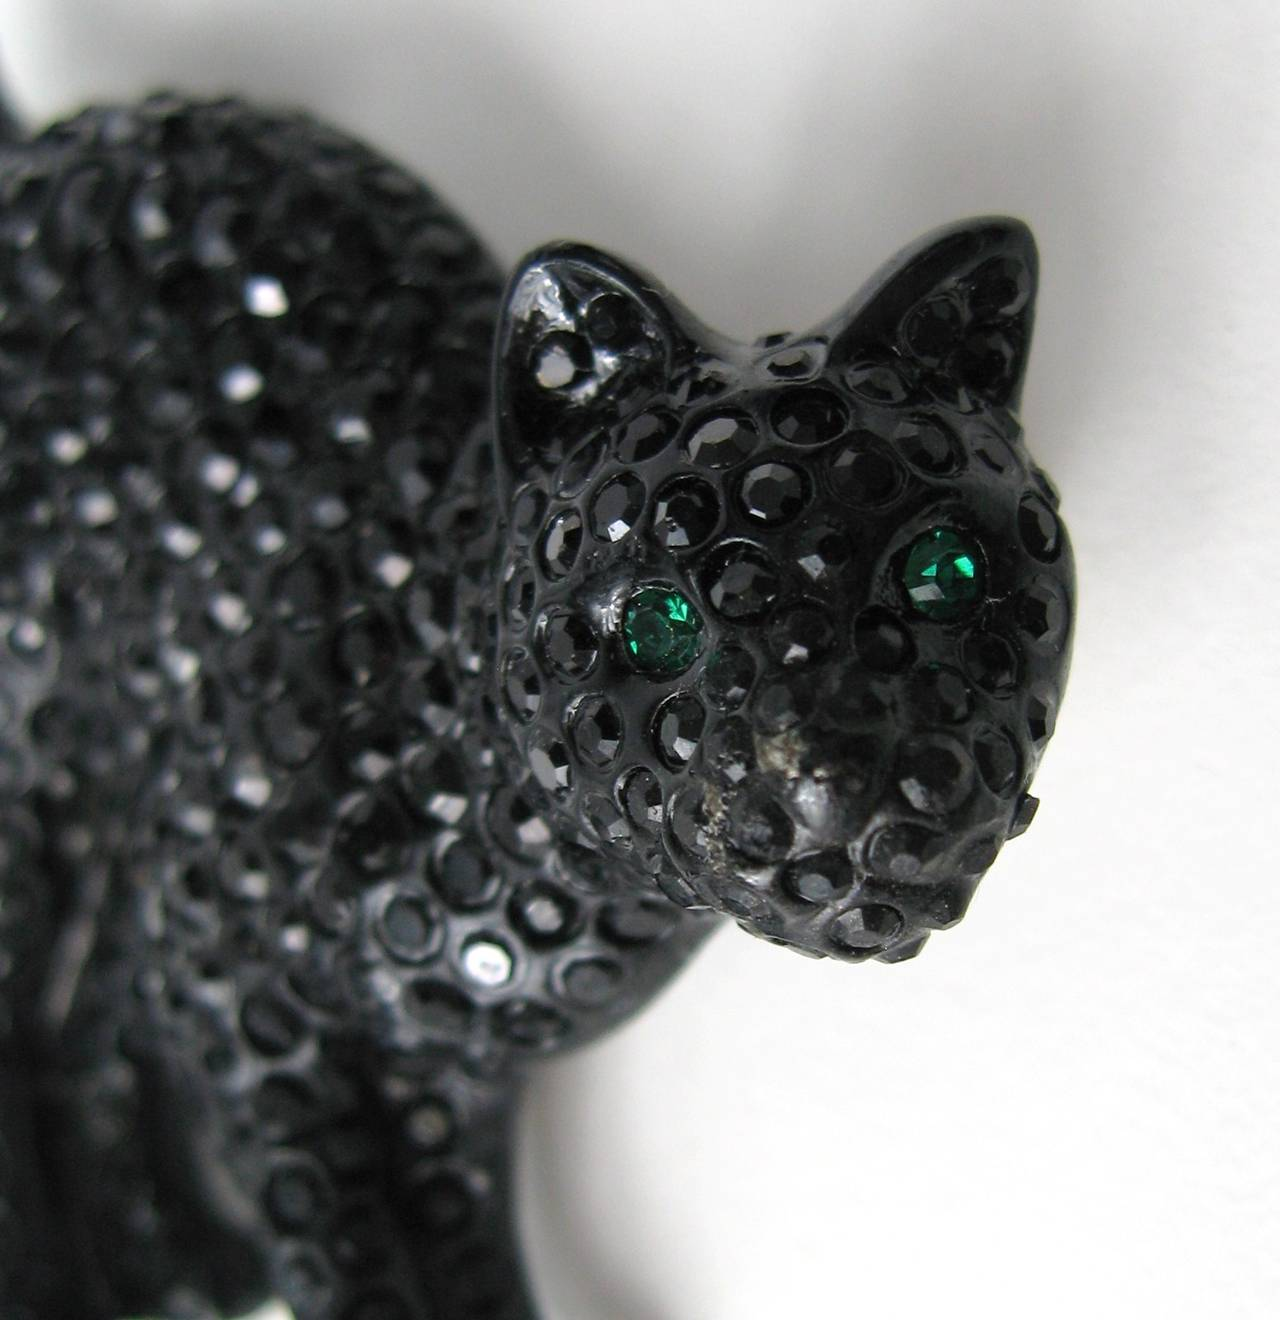 Swarovski Crystal Glitz Black Cat Brooch Pin New Never Worn  2